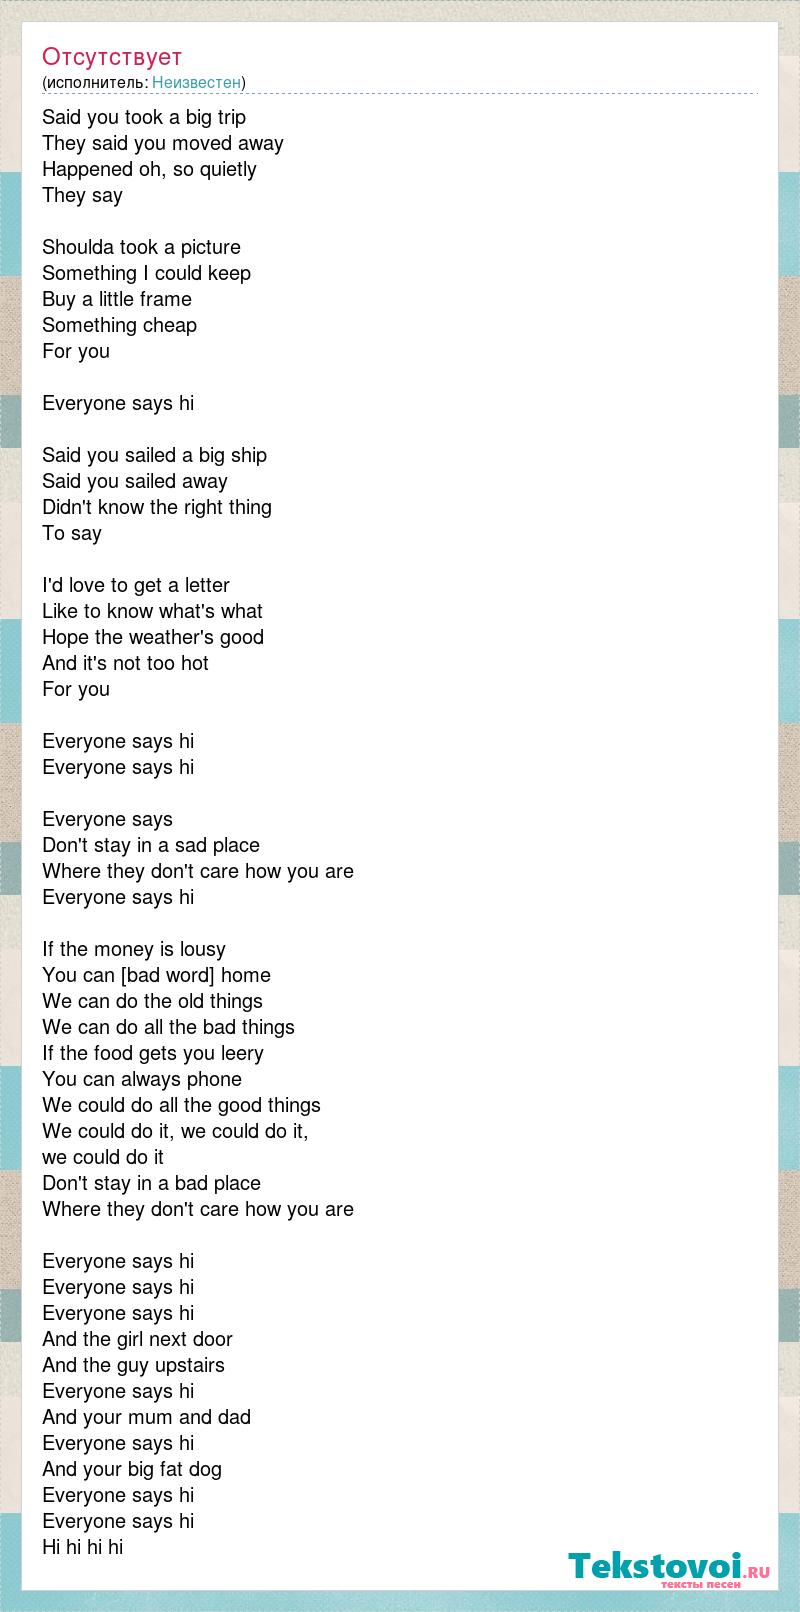 Неизвестен: Отсутствует слова песни